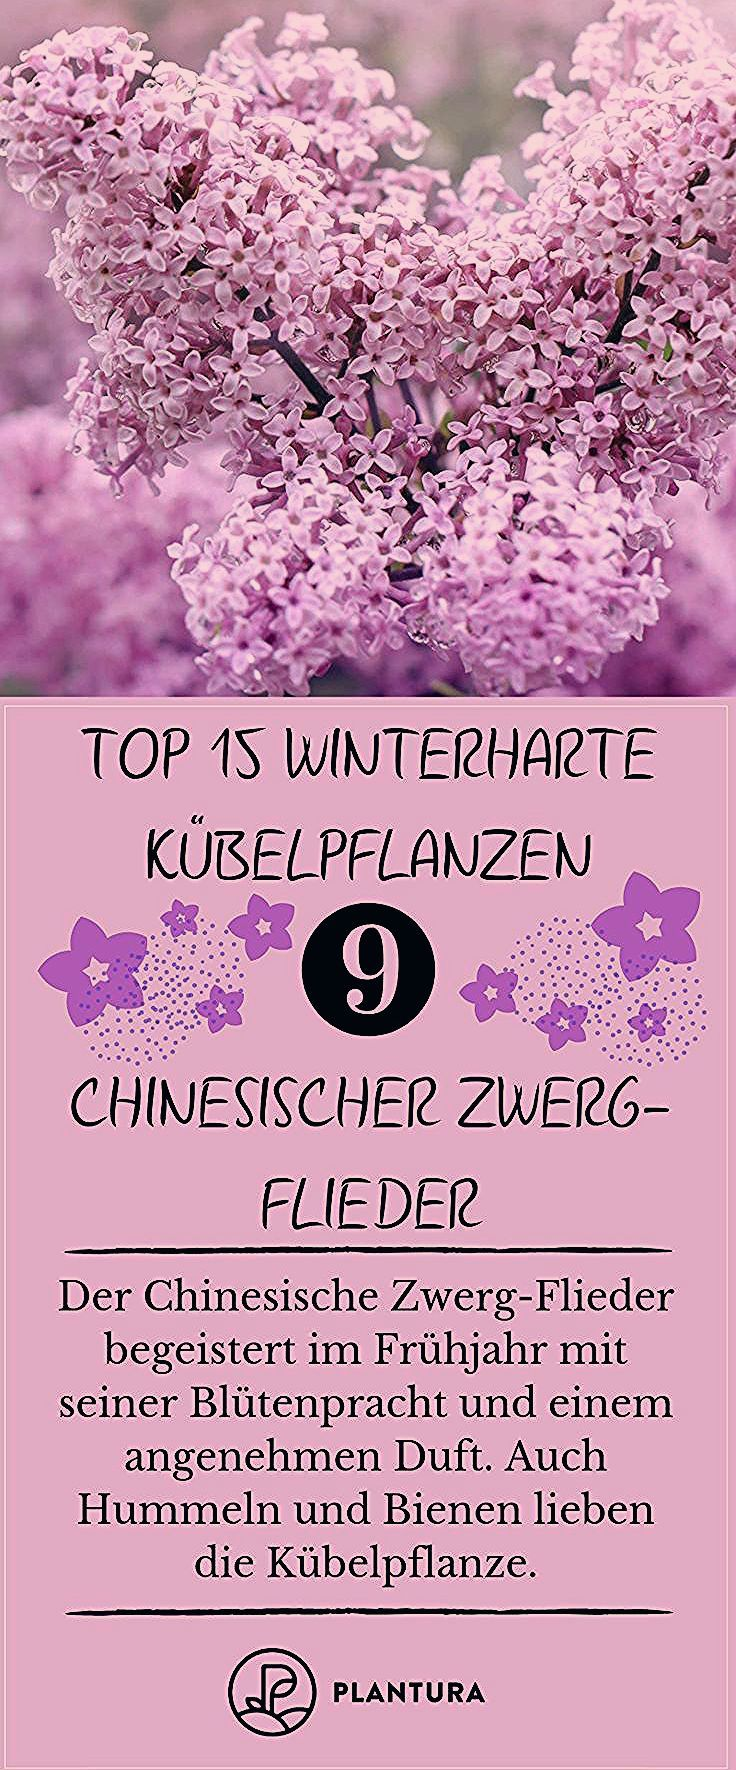 Photo of Winterharte Kübelpflanzen: Unsere Top 15 – Plantura